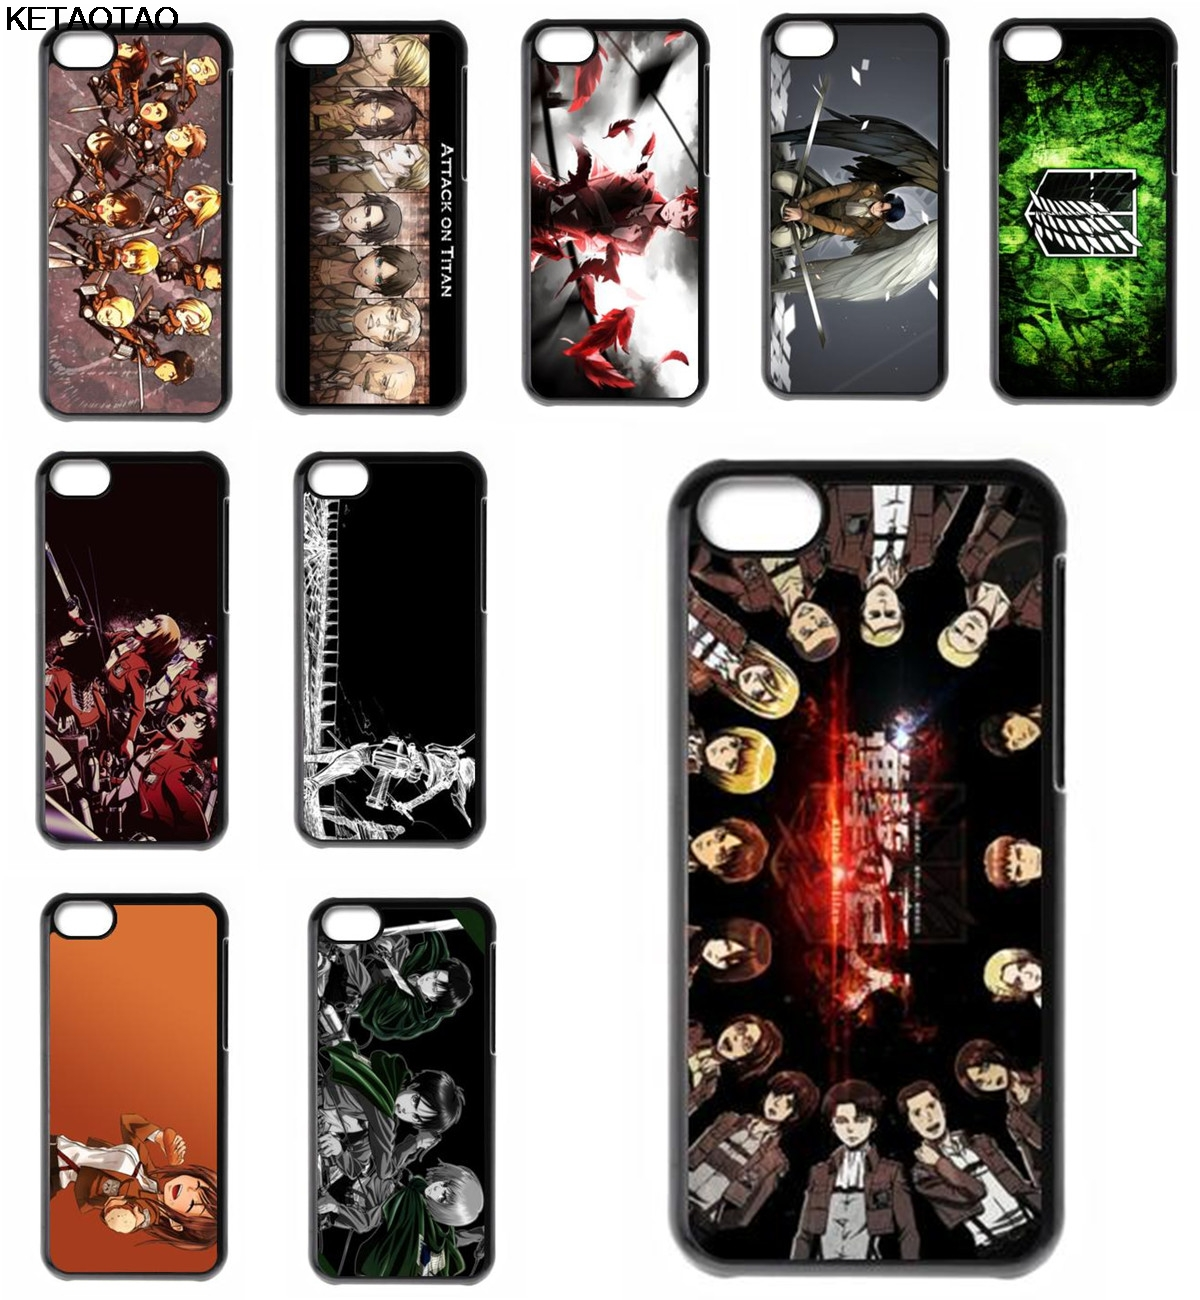 KETAOTAO Attack on Titan Shingeki no Kyojin Phone Cases for Samsung S4 5 6 7 8 9 NOTE 2 3 4 5 7 8 Case Soft TPU Rubber Silicone